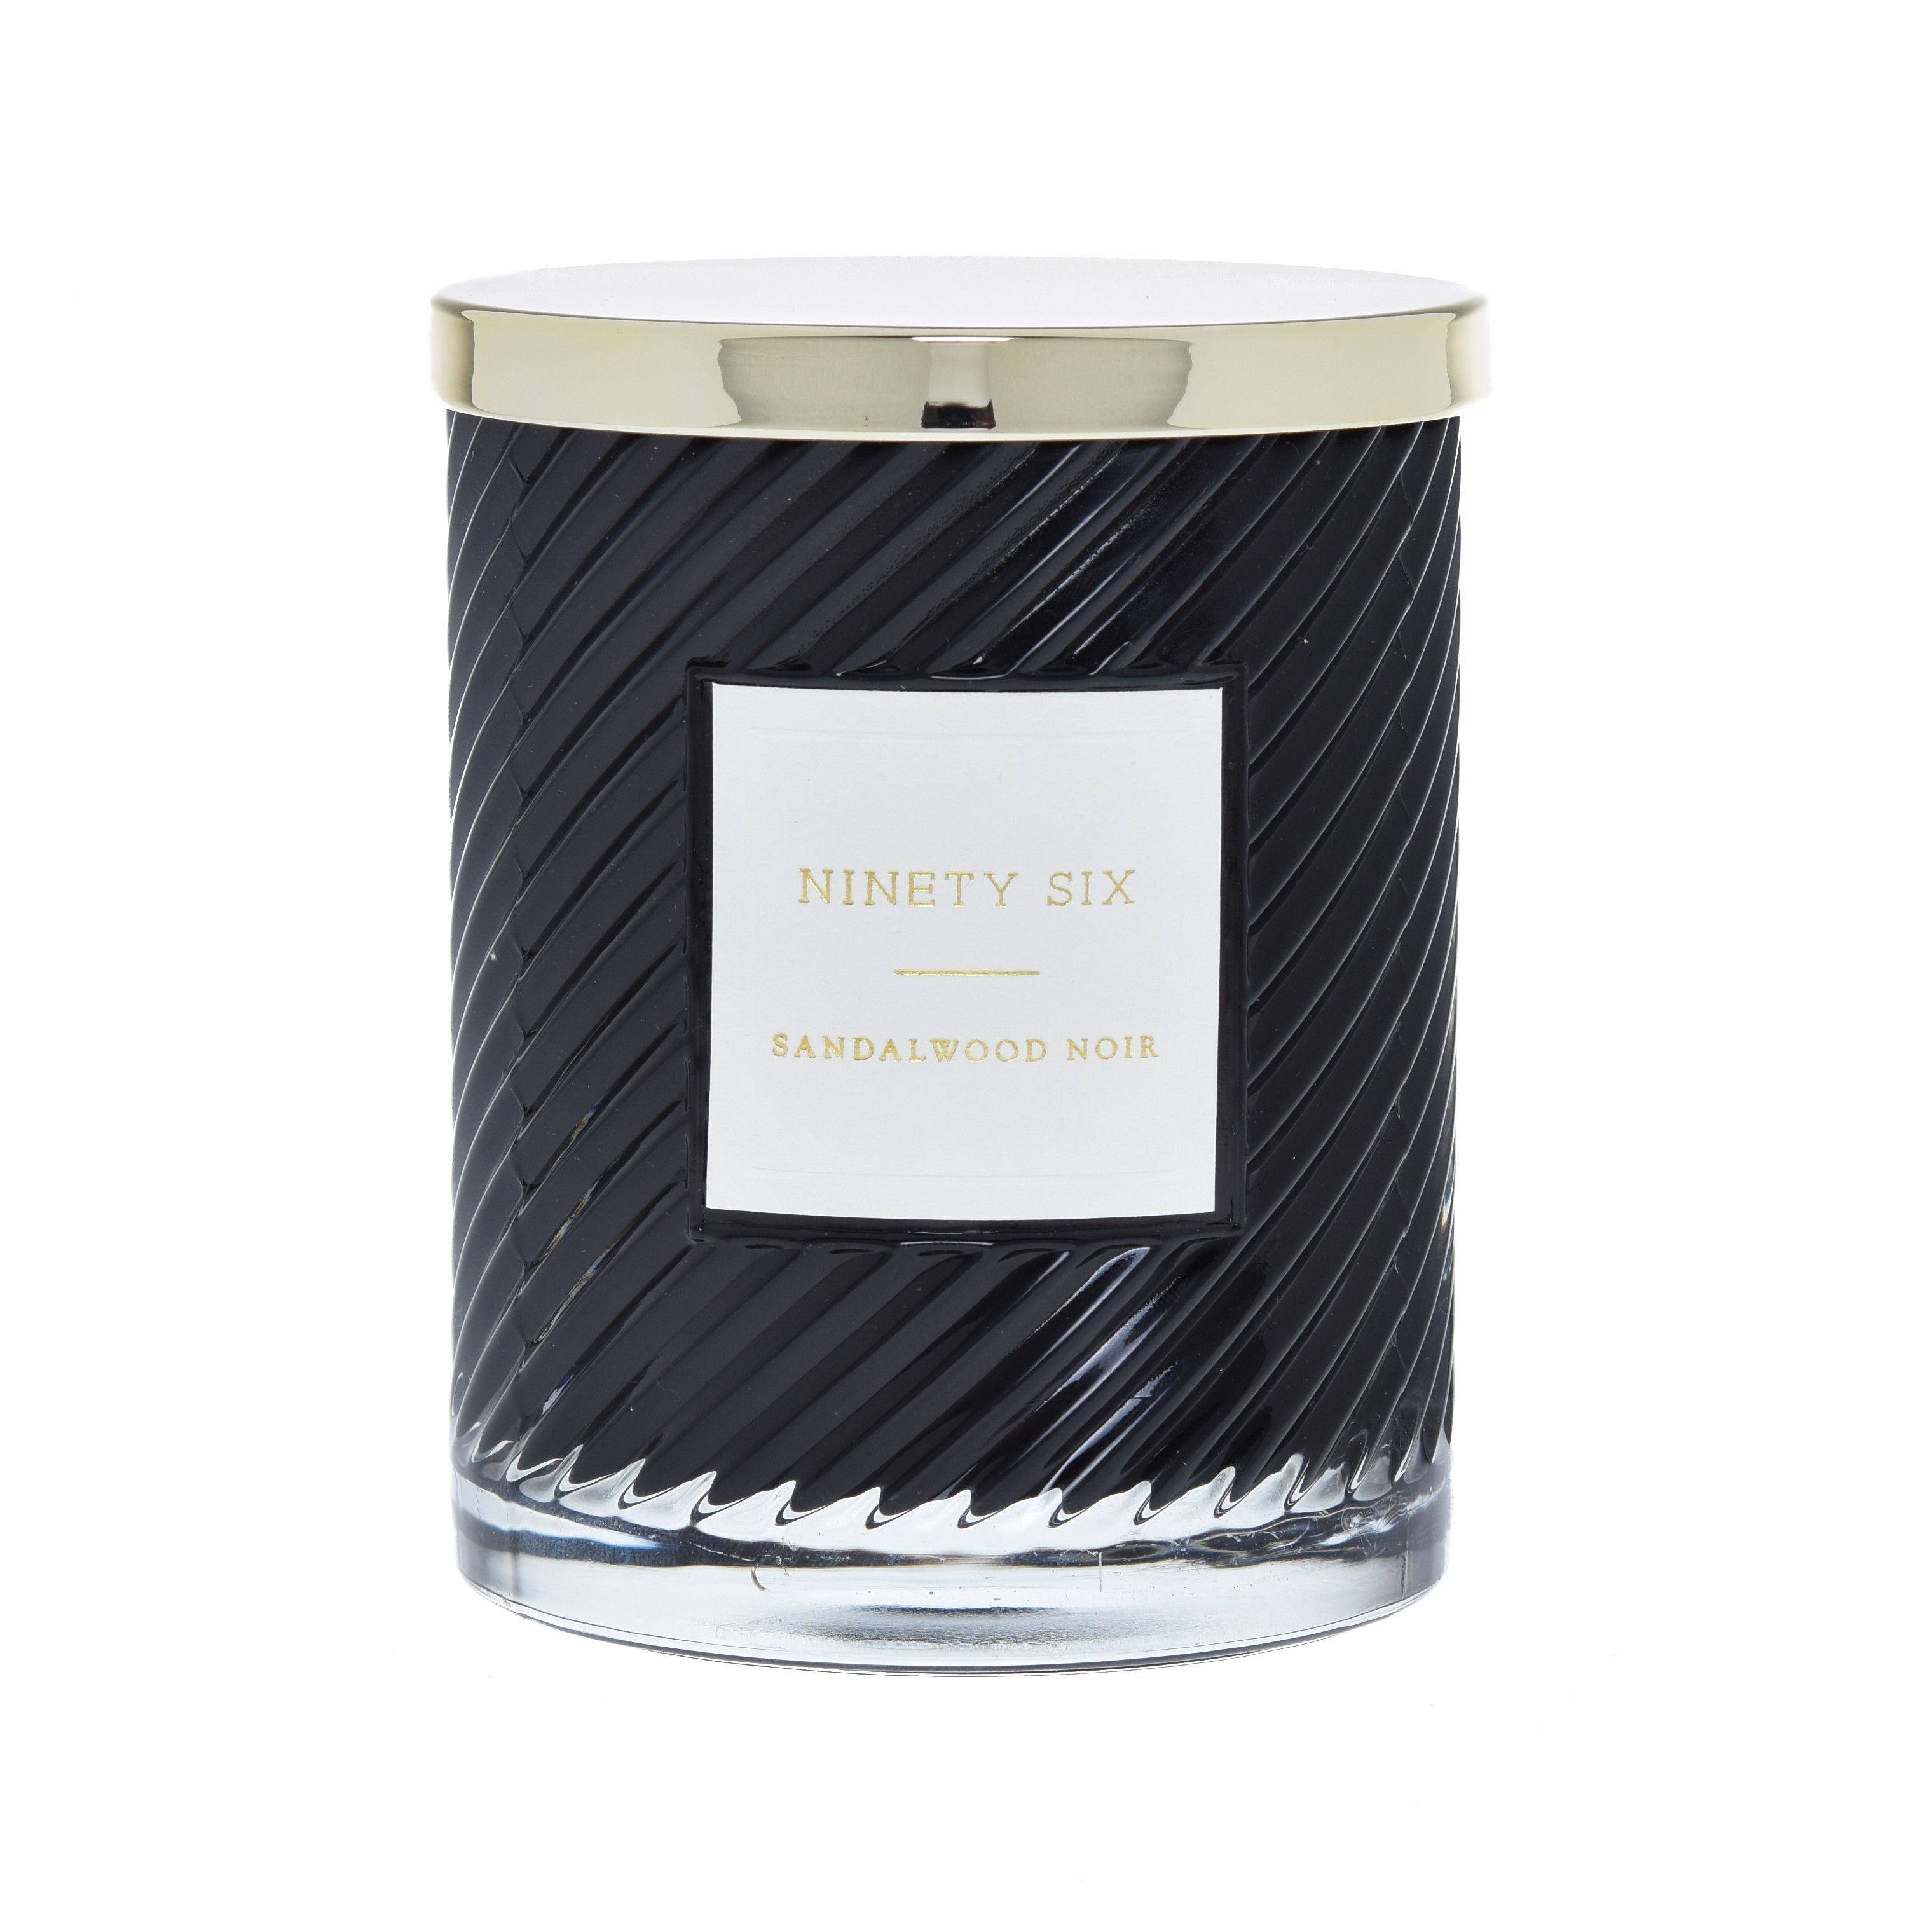 Sandalwood Noir Scented Candle Jars Dw Home Candles Neroli